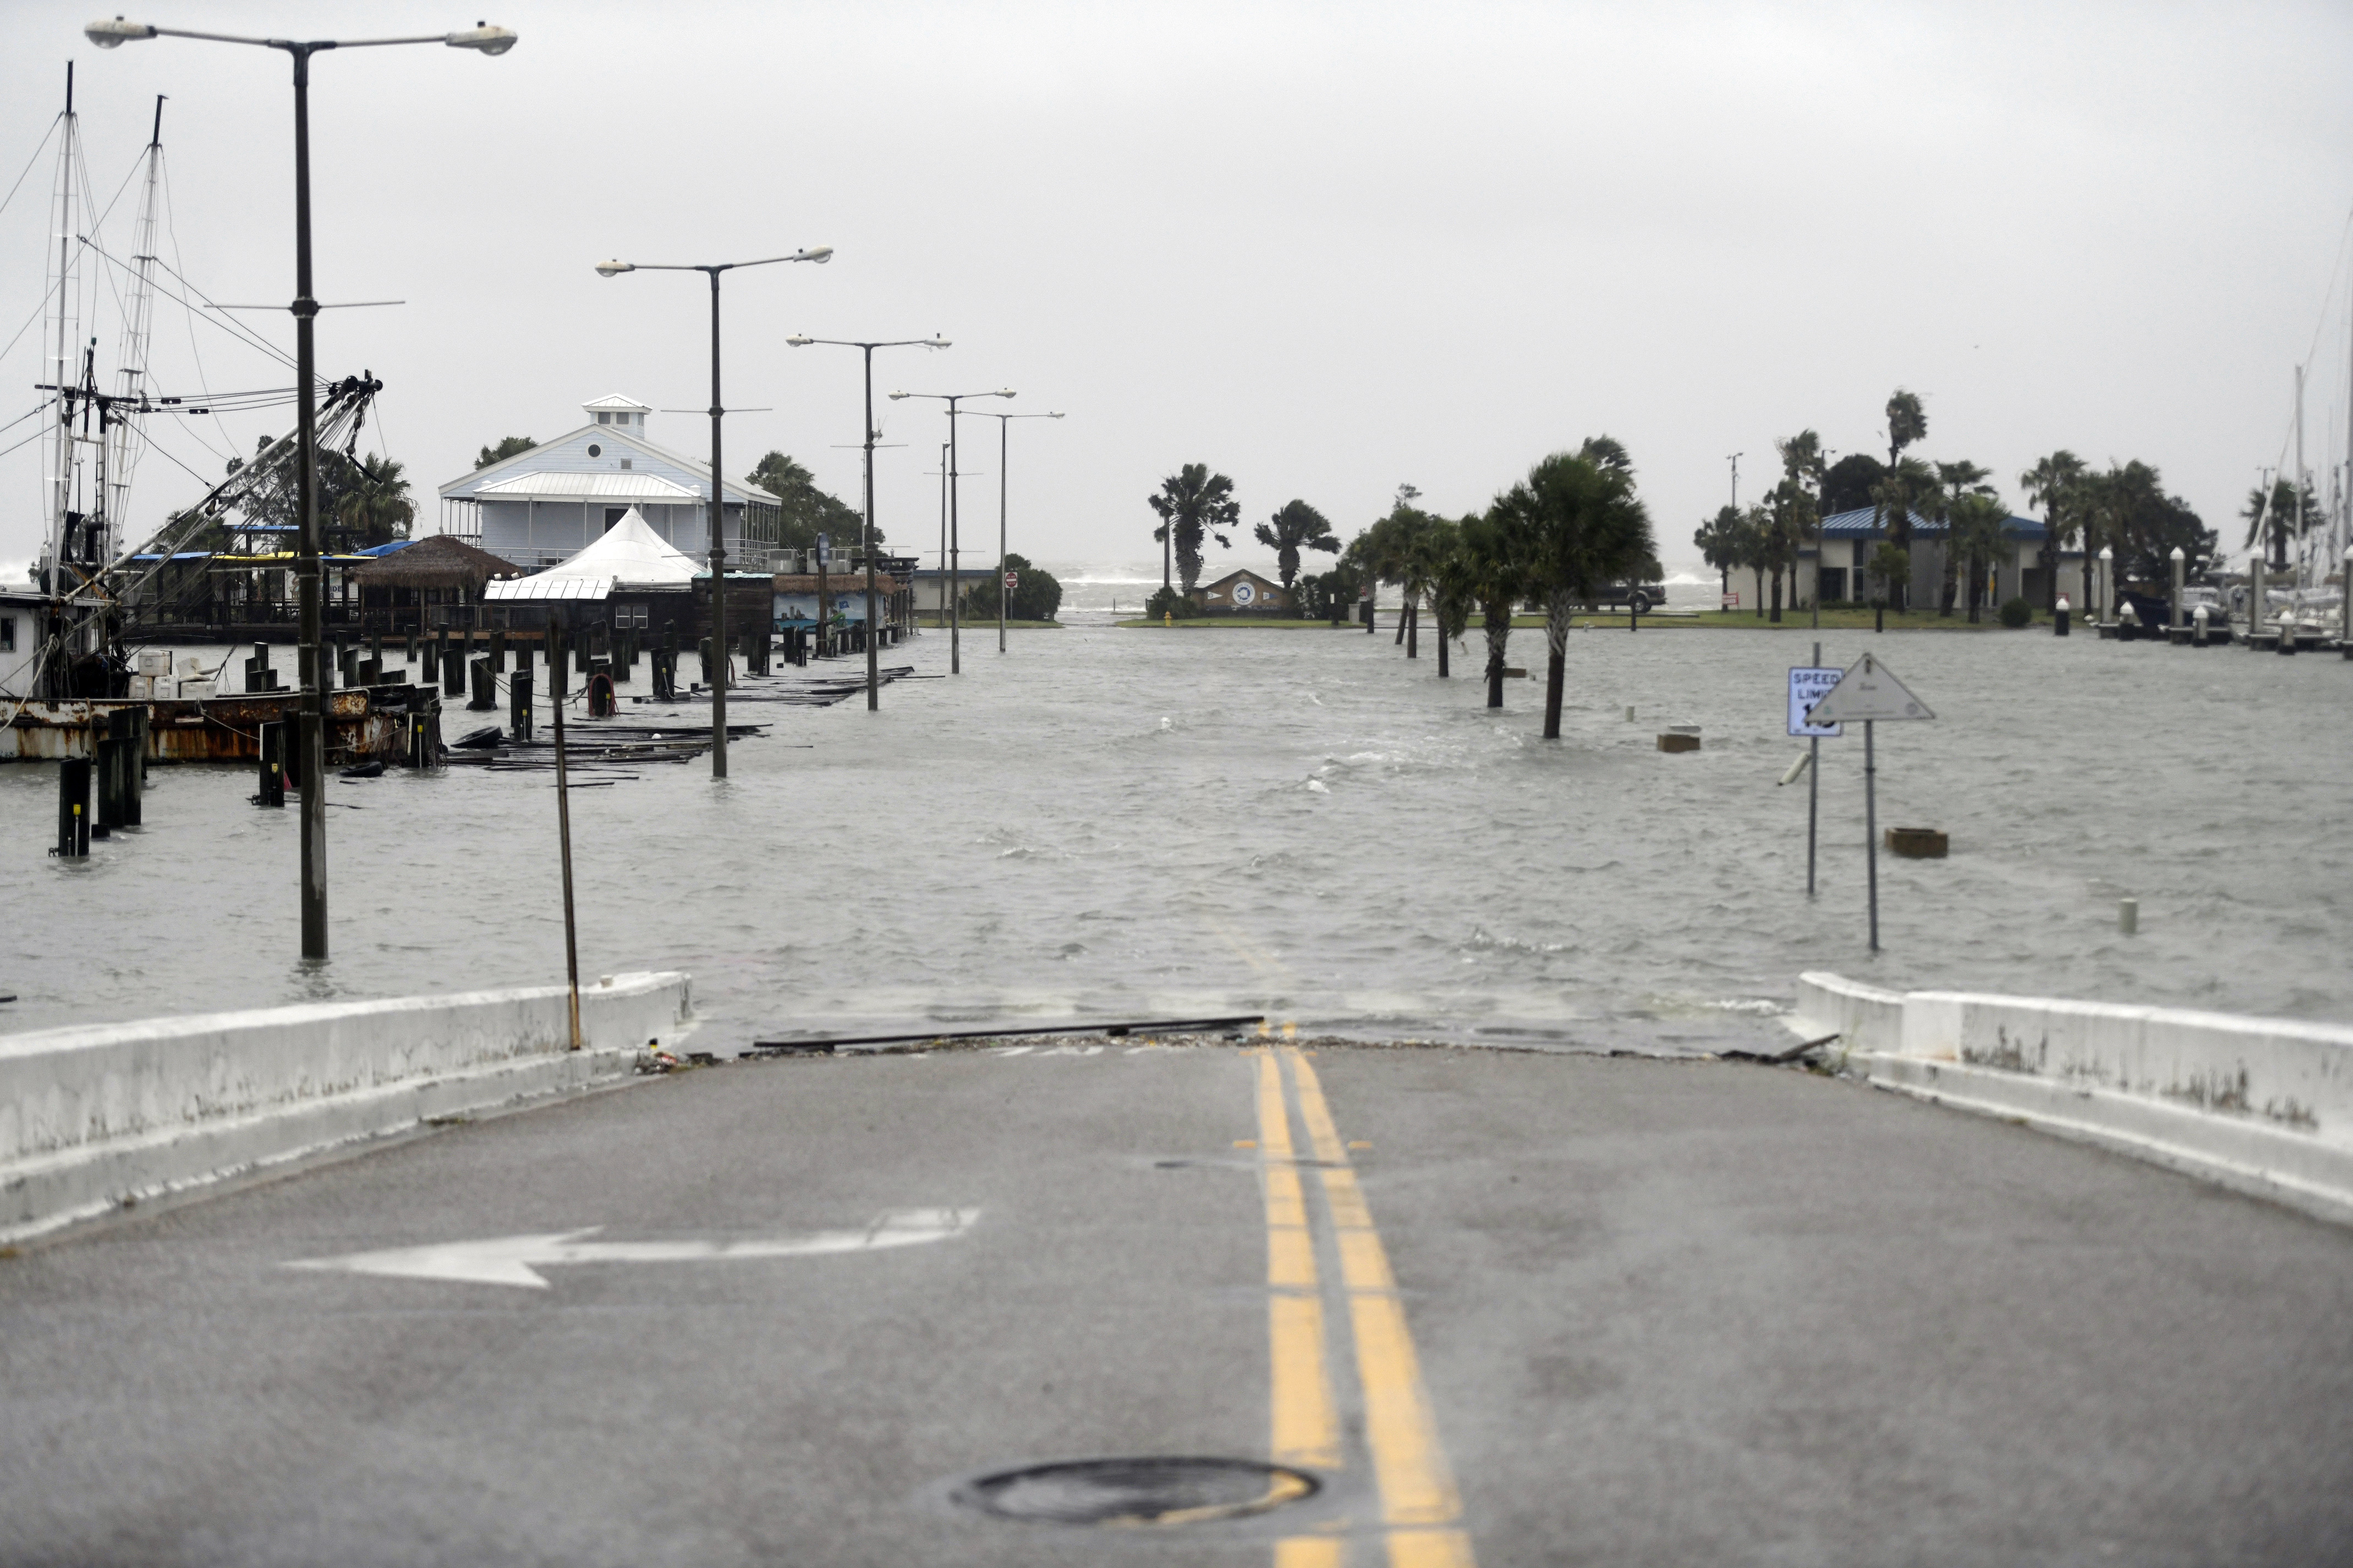 Una calle inundada en Corpus Christi, Texas. (Annie Rice/Corpus Christi Caller-Times via AP)